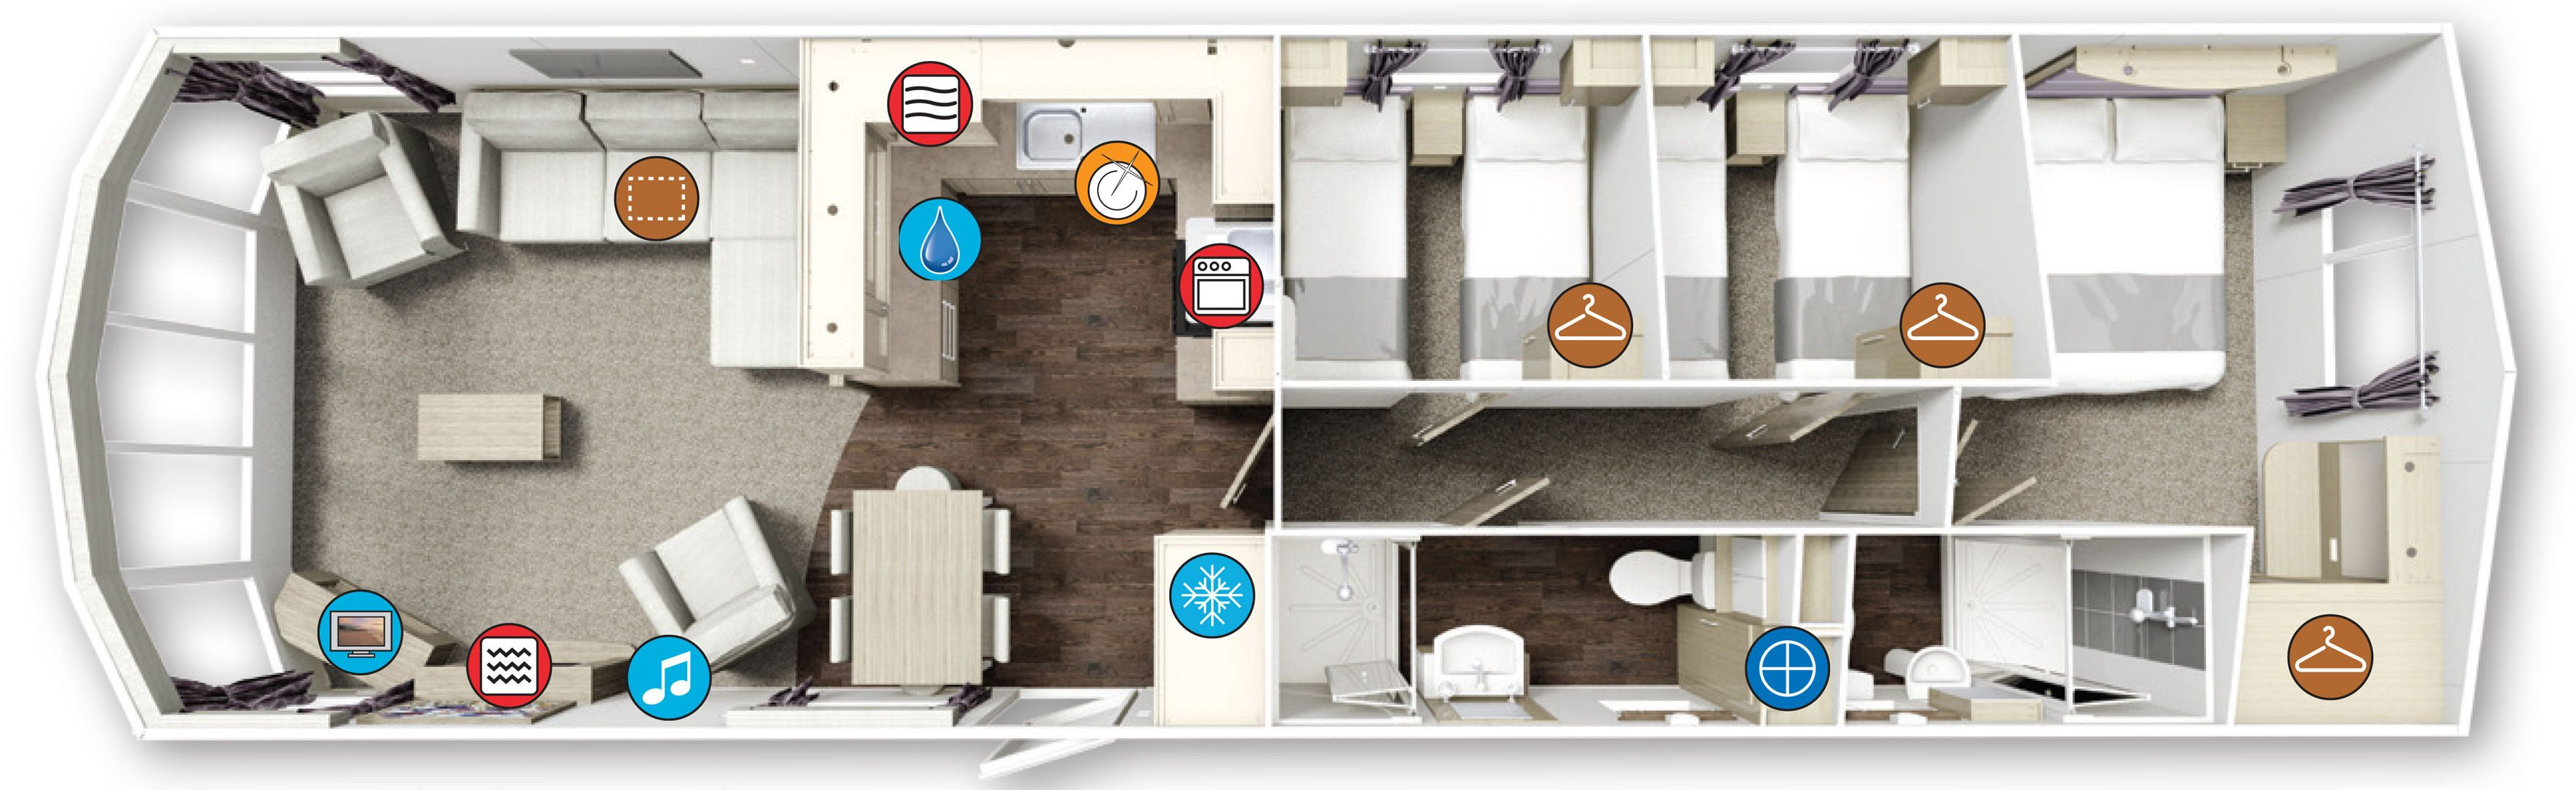 Willerby Aspen 2016 3 Bed Floor Plan Caravan Holiday Holiday Home Floor Plans